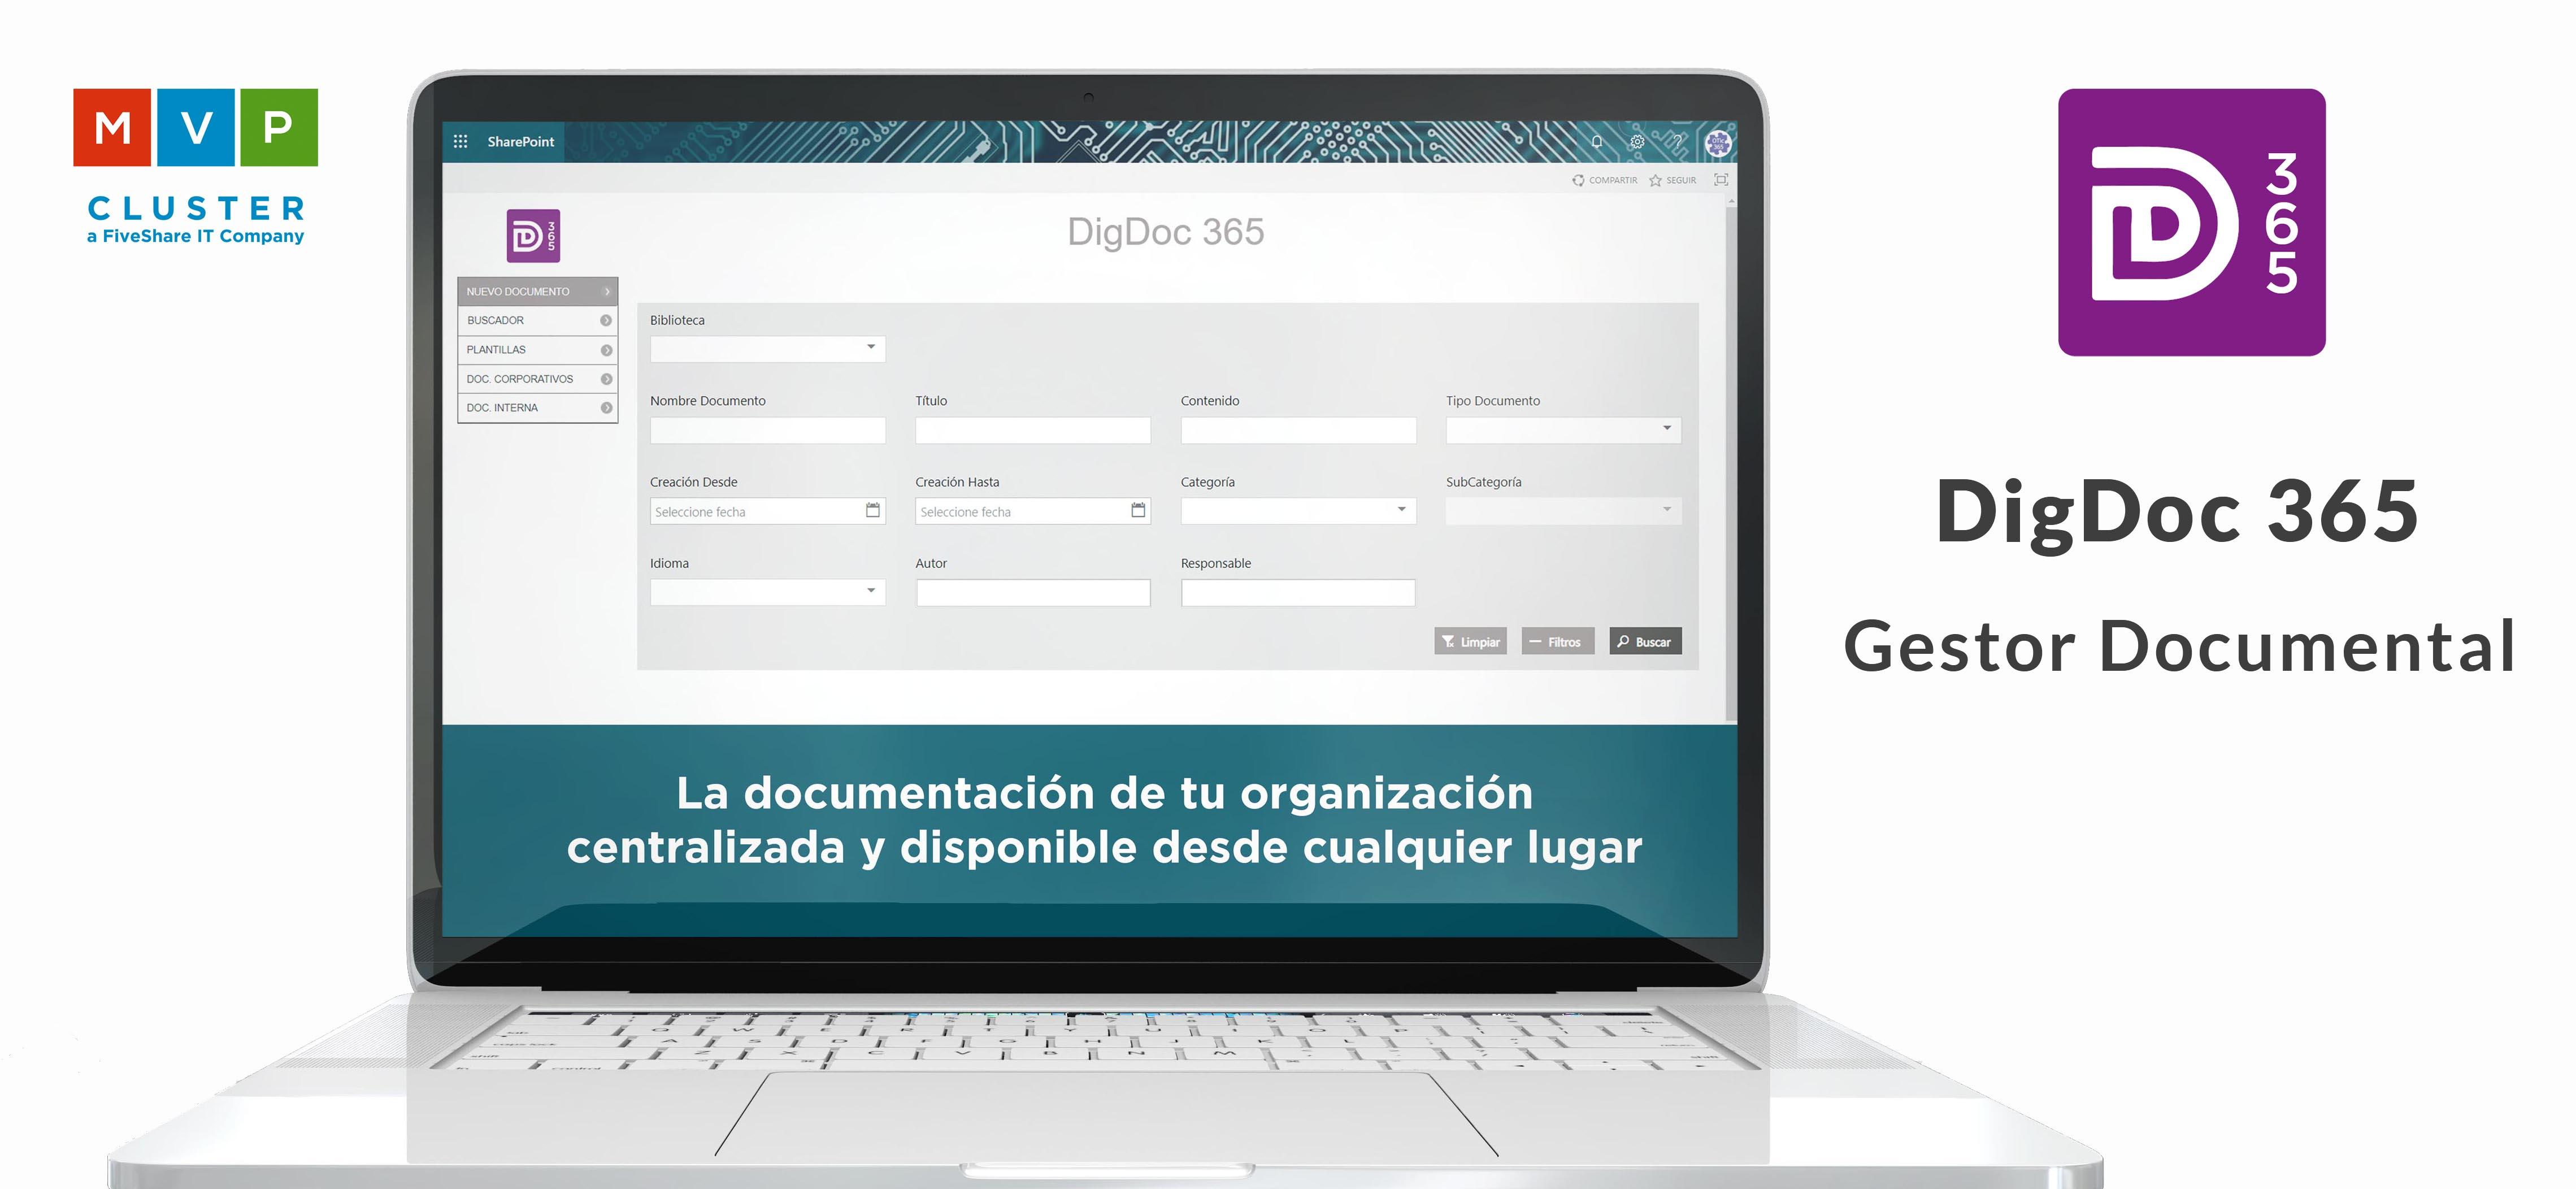 DigDoc 365 Gestor Documental